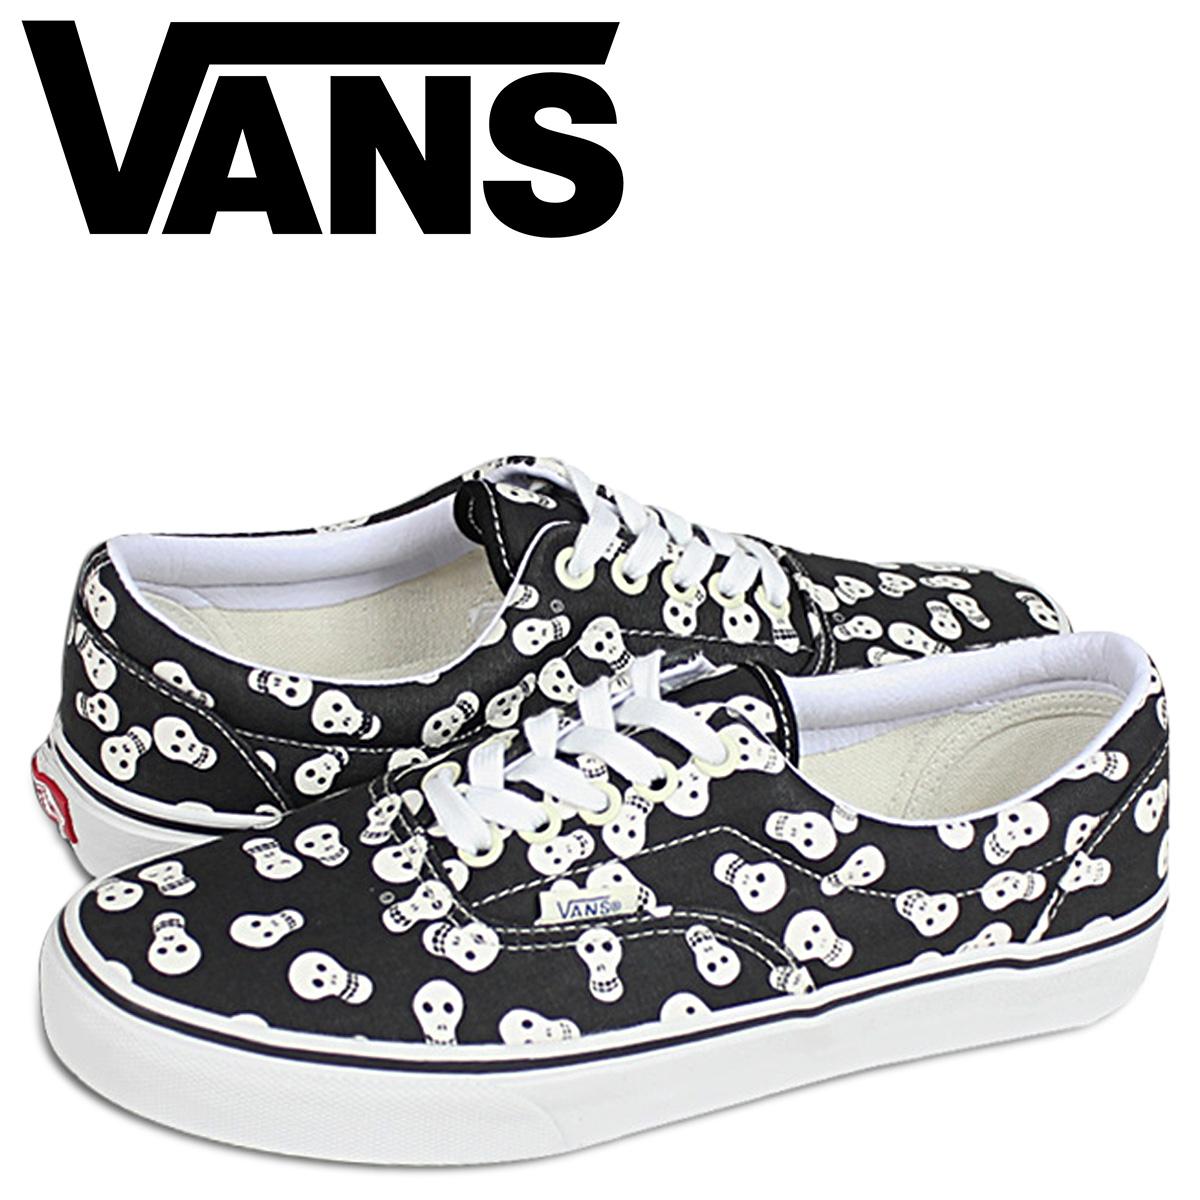 8465db77b4 Vans VANS gills sneakers ERA VAN DOREN VN-0Y6XF15 men gap Dis shoes black  black